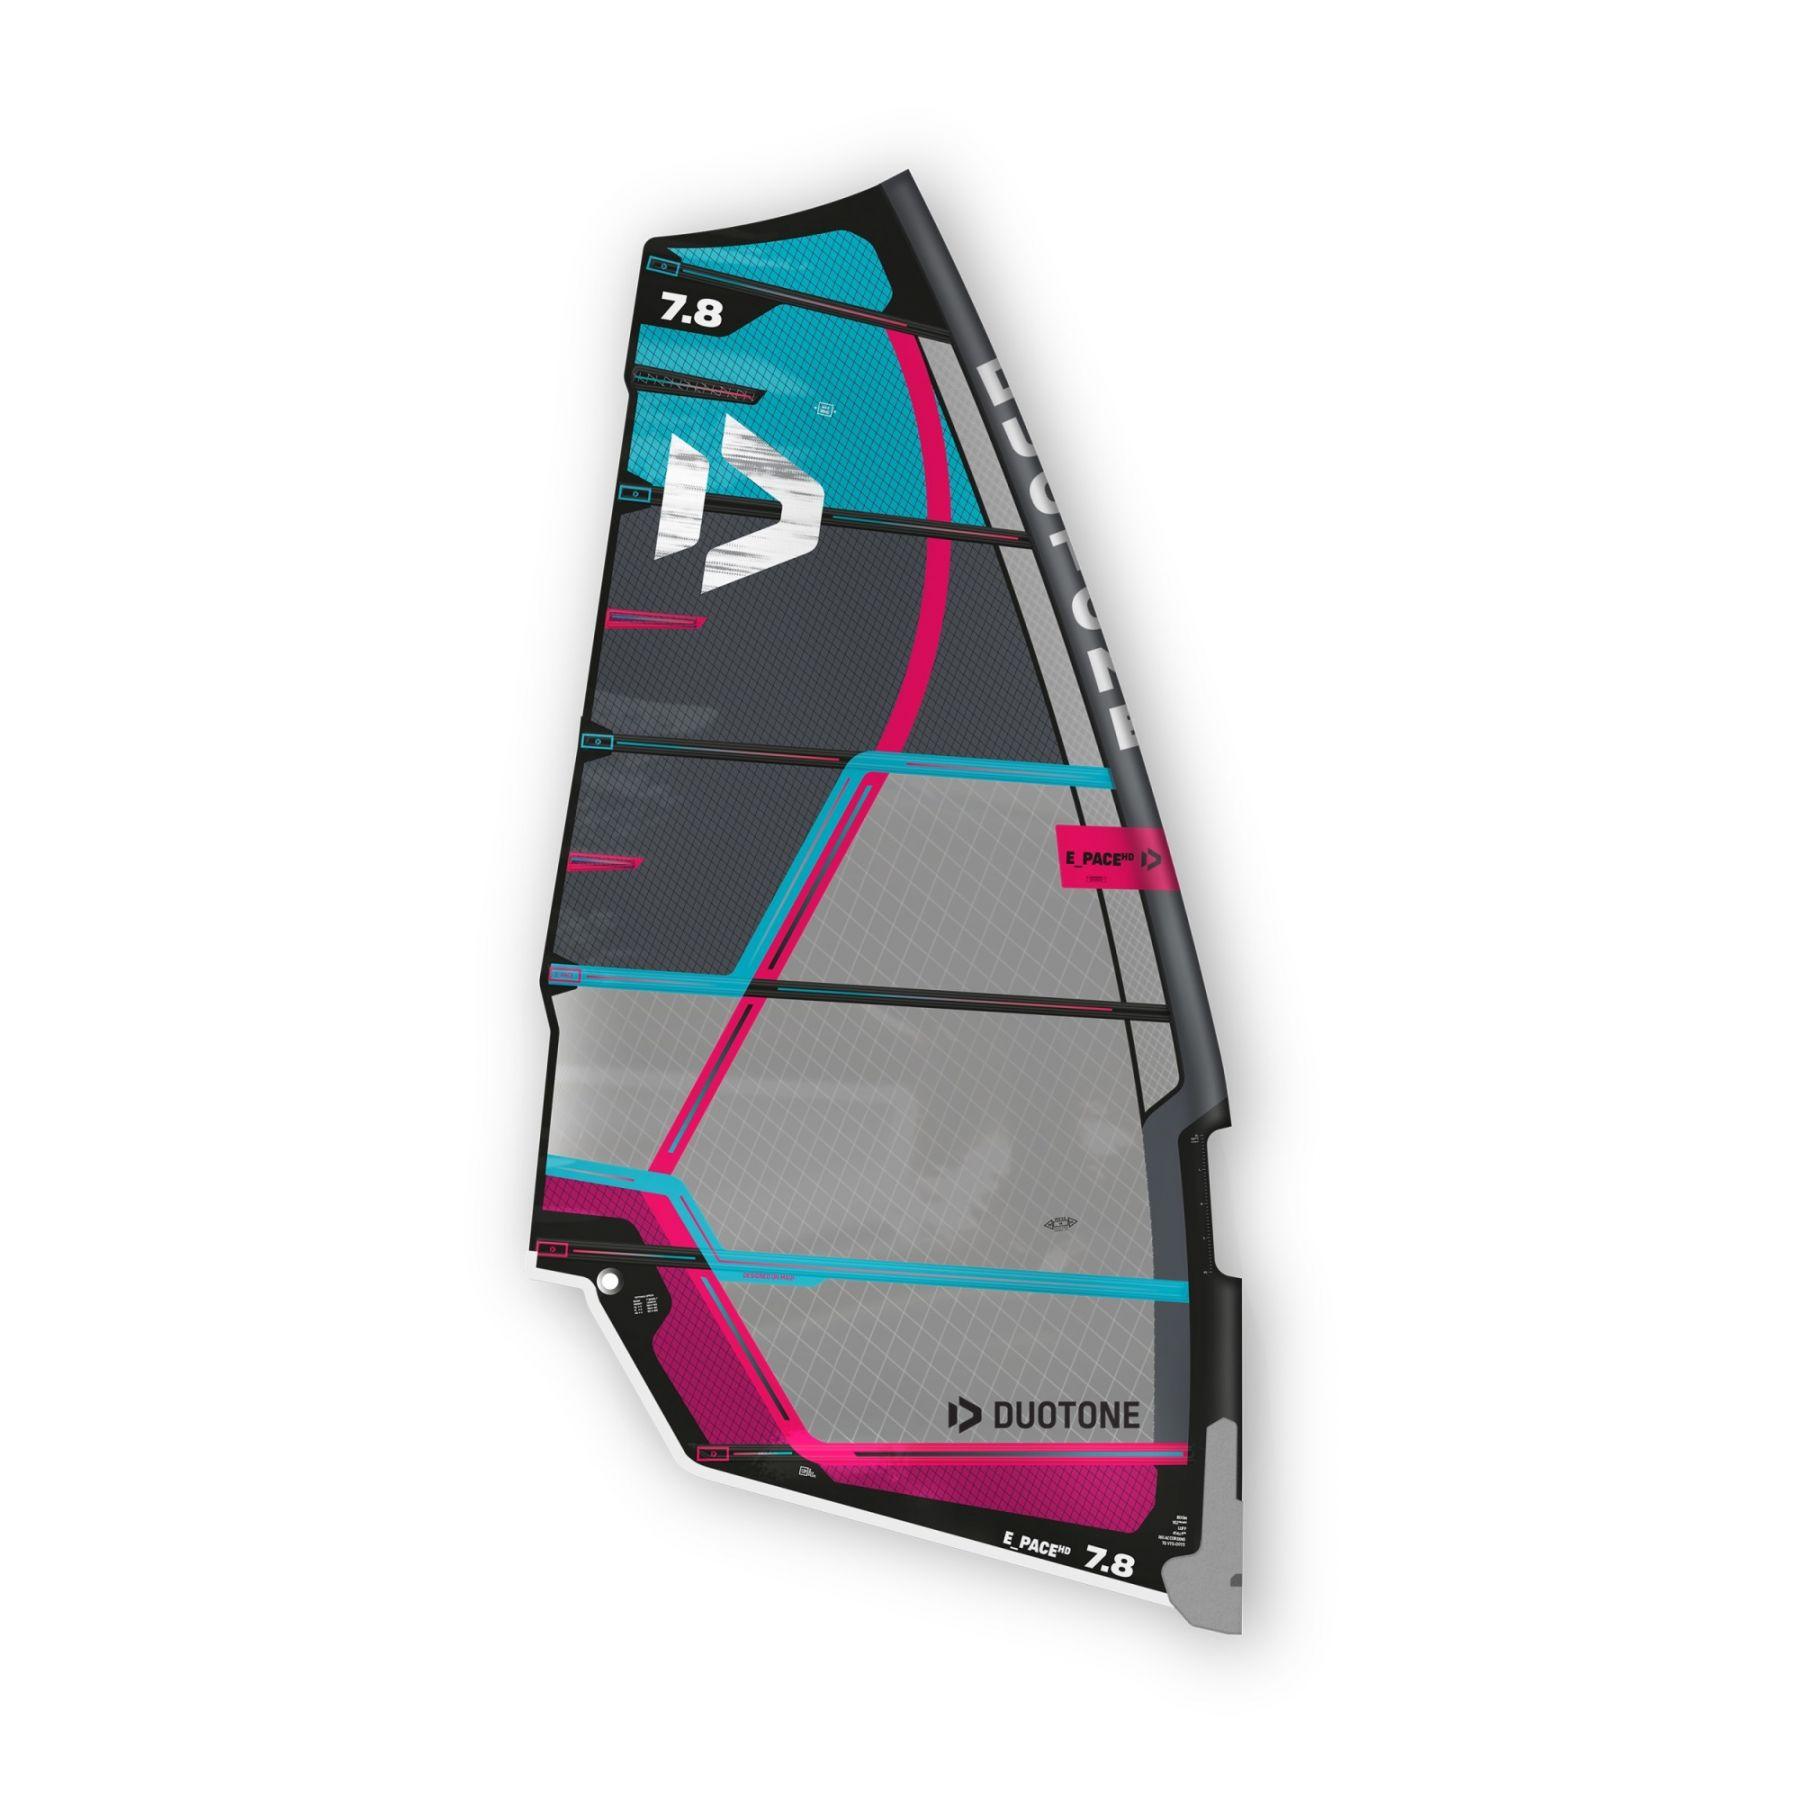 Vela de windsurf Duotone E Pace HD azul